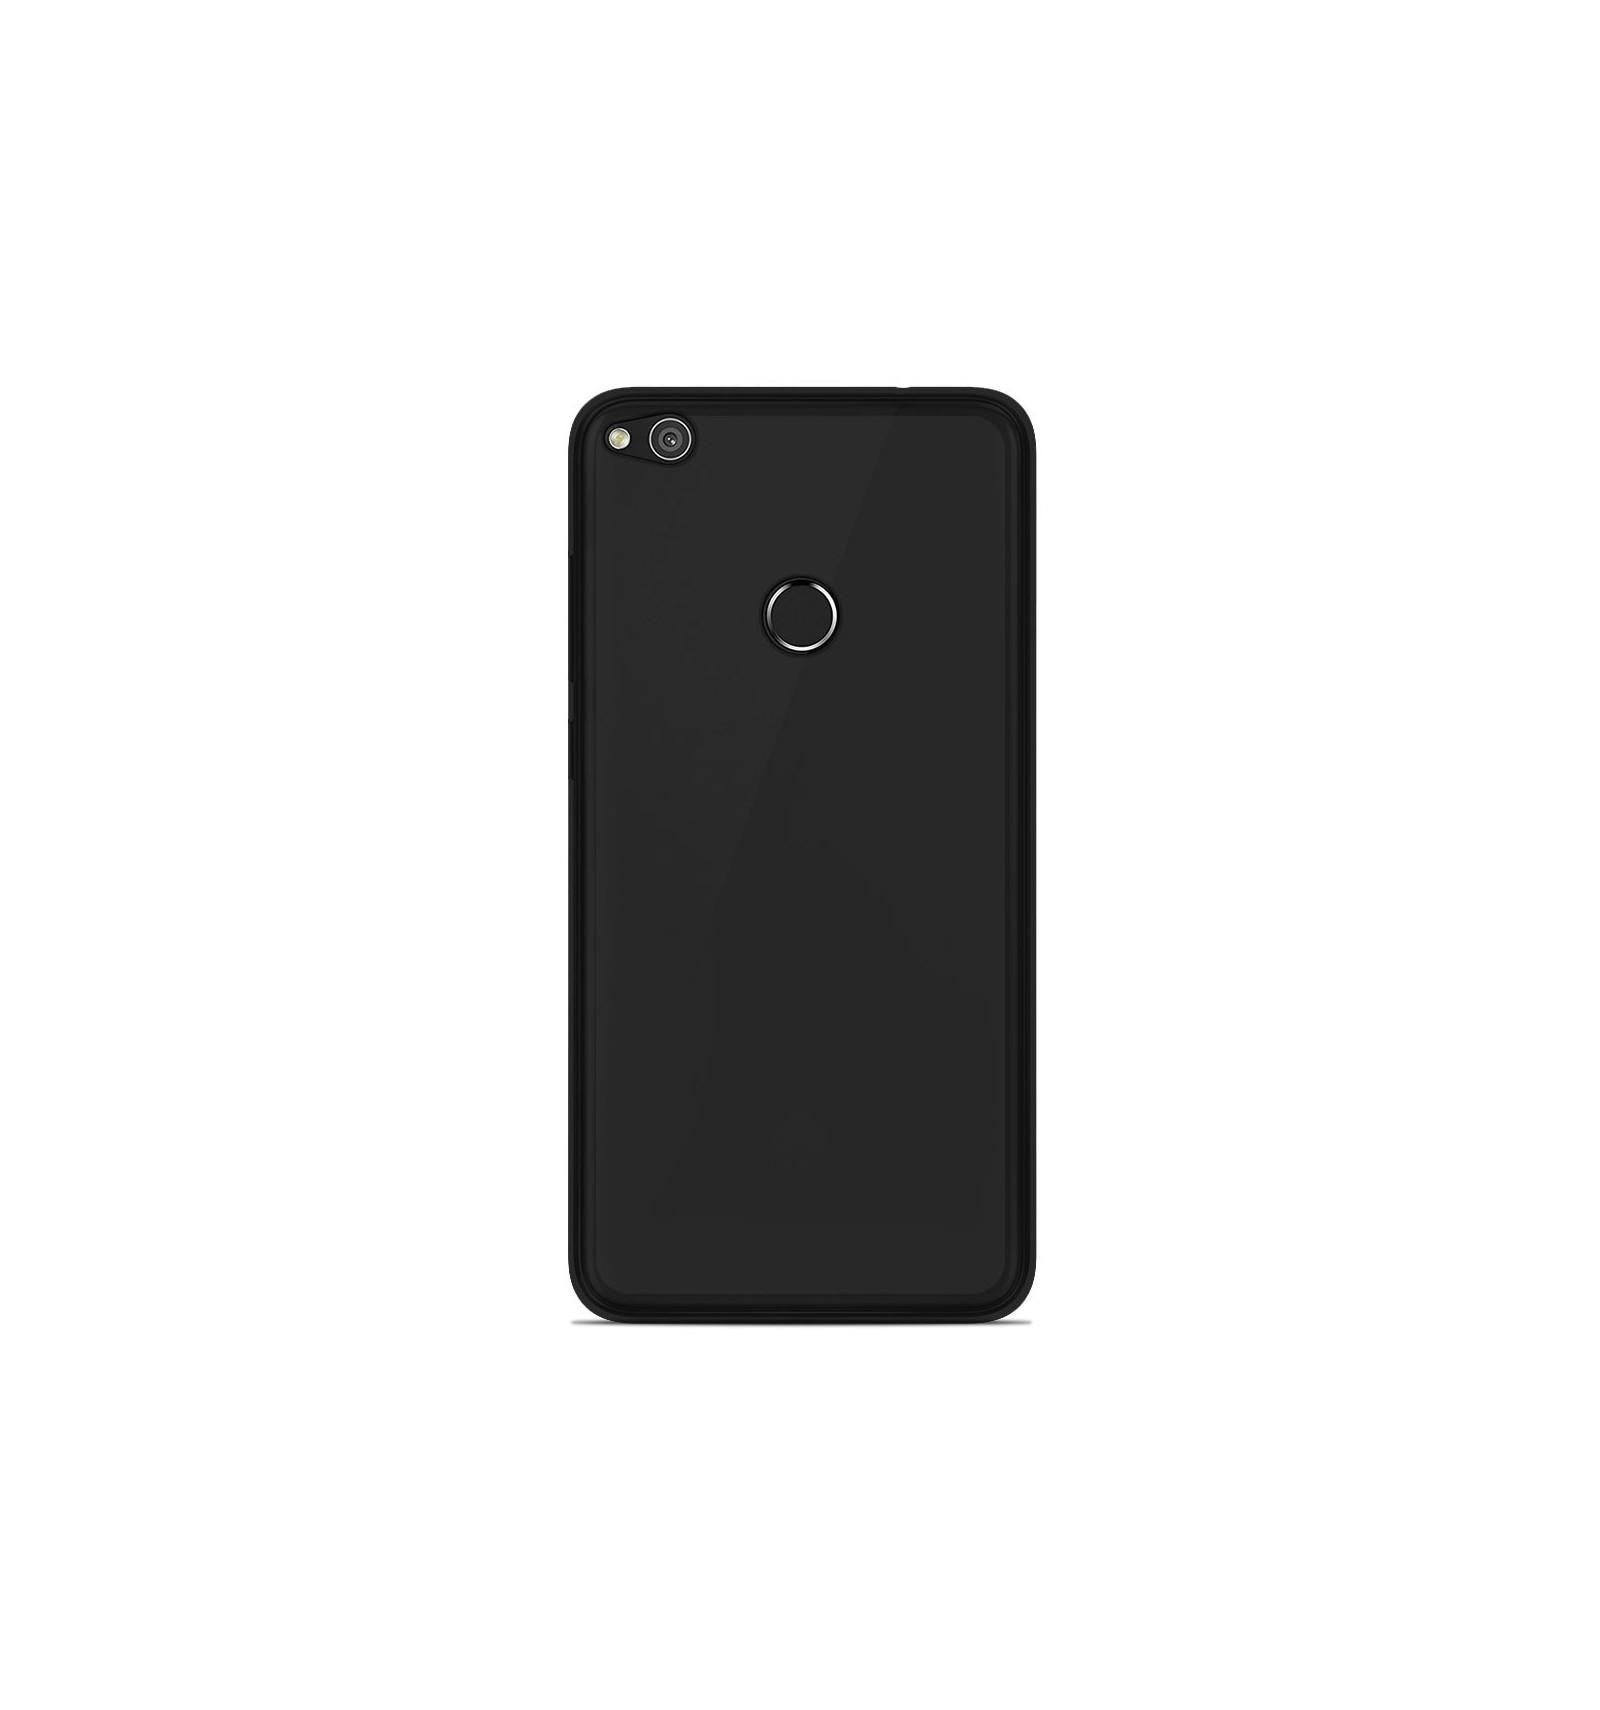 coque huawei p8 lite 2017 silicone noir